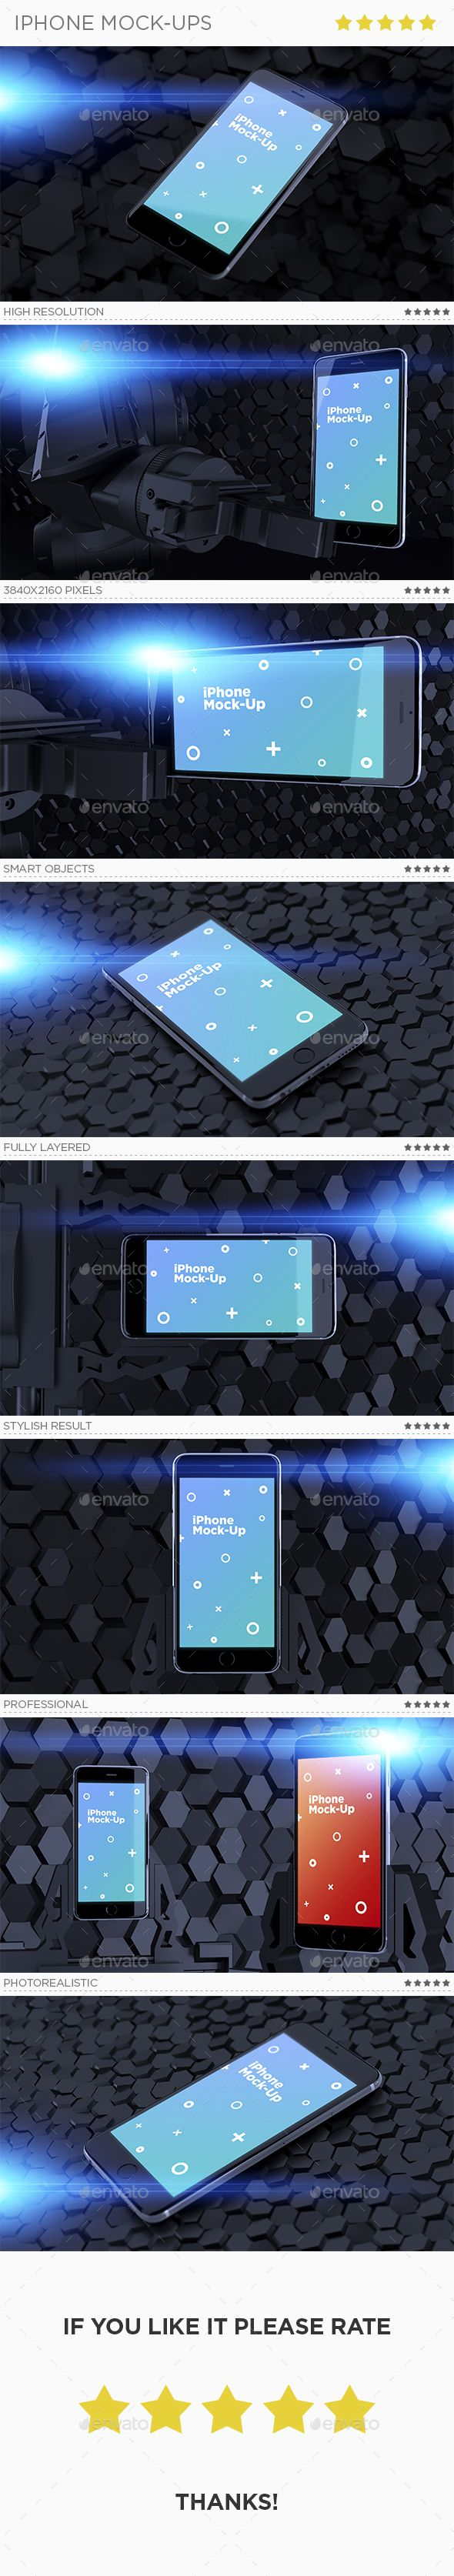 iPhone Mock-Ups